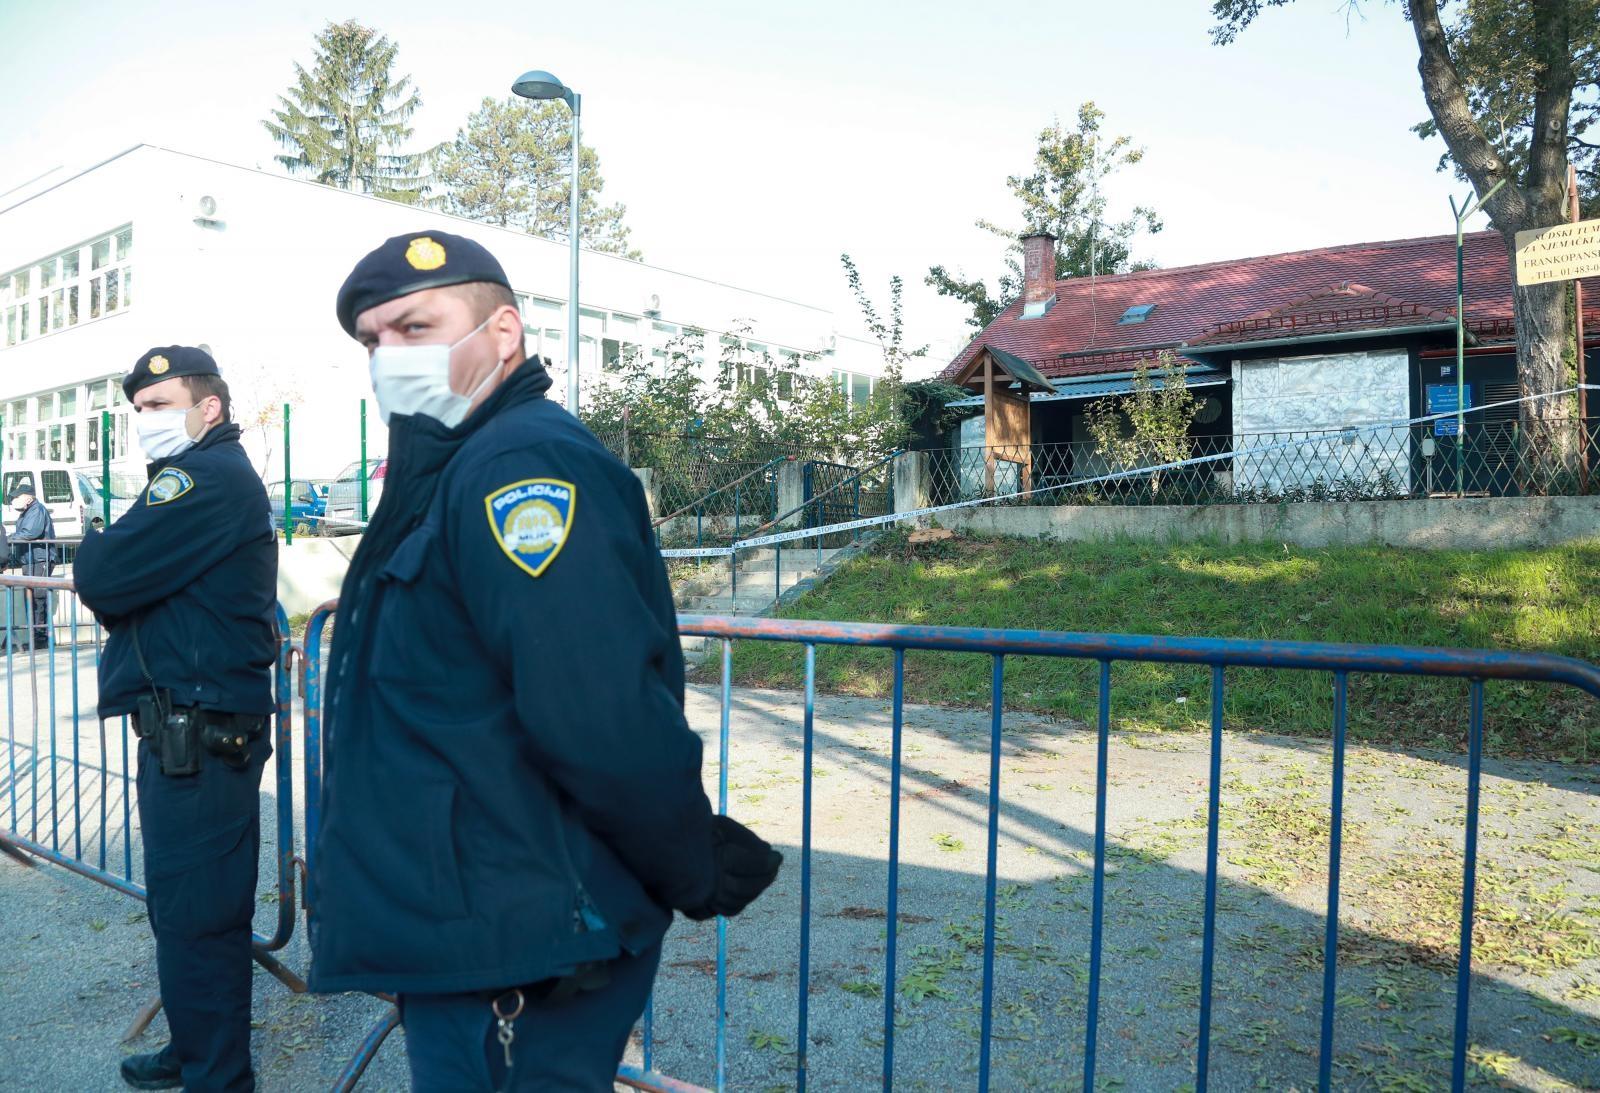 Policija je ogradila prostor, a uskoro je stigao sudski izvršitelj i počela je deložacija.